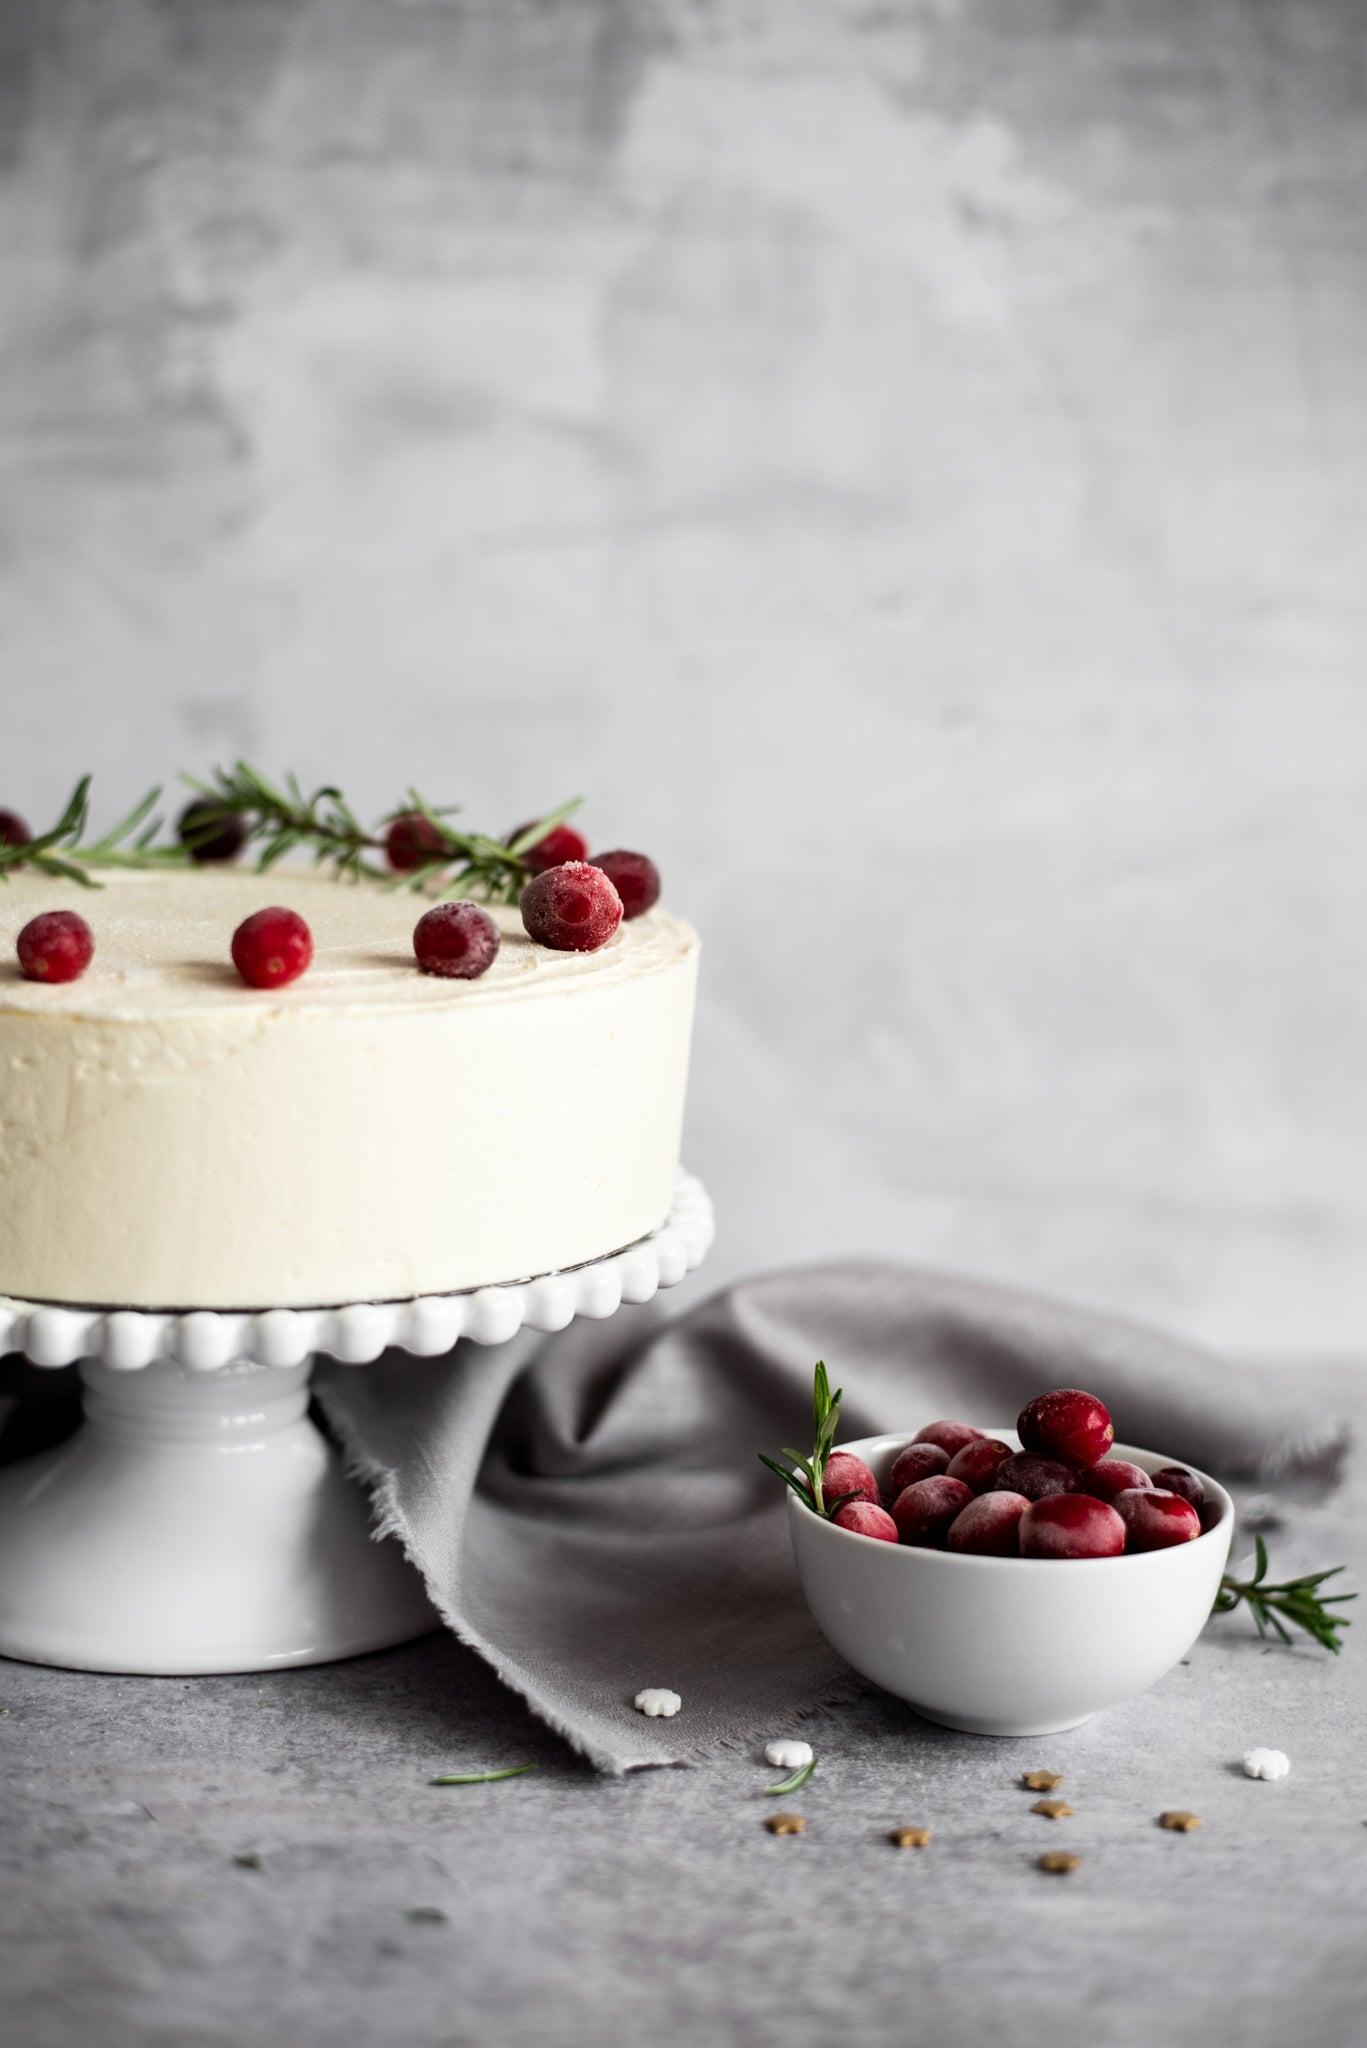 Snowy-White-Christmas-Cake-WEB-RES-3.jpg